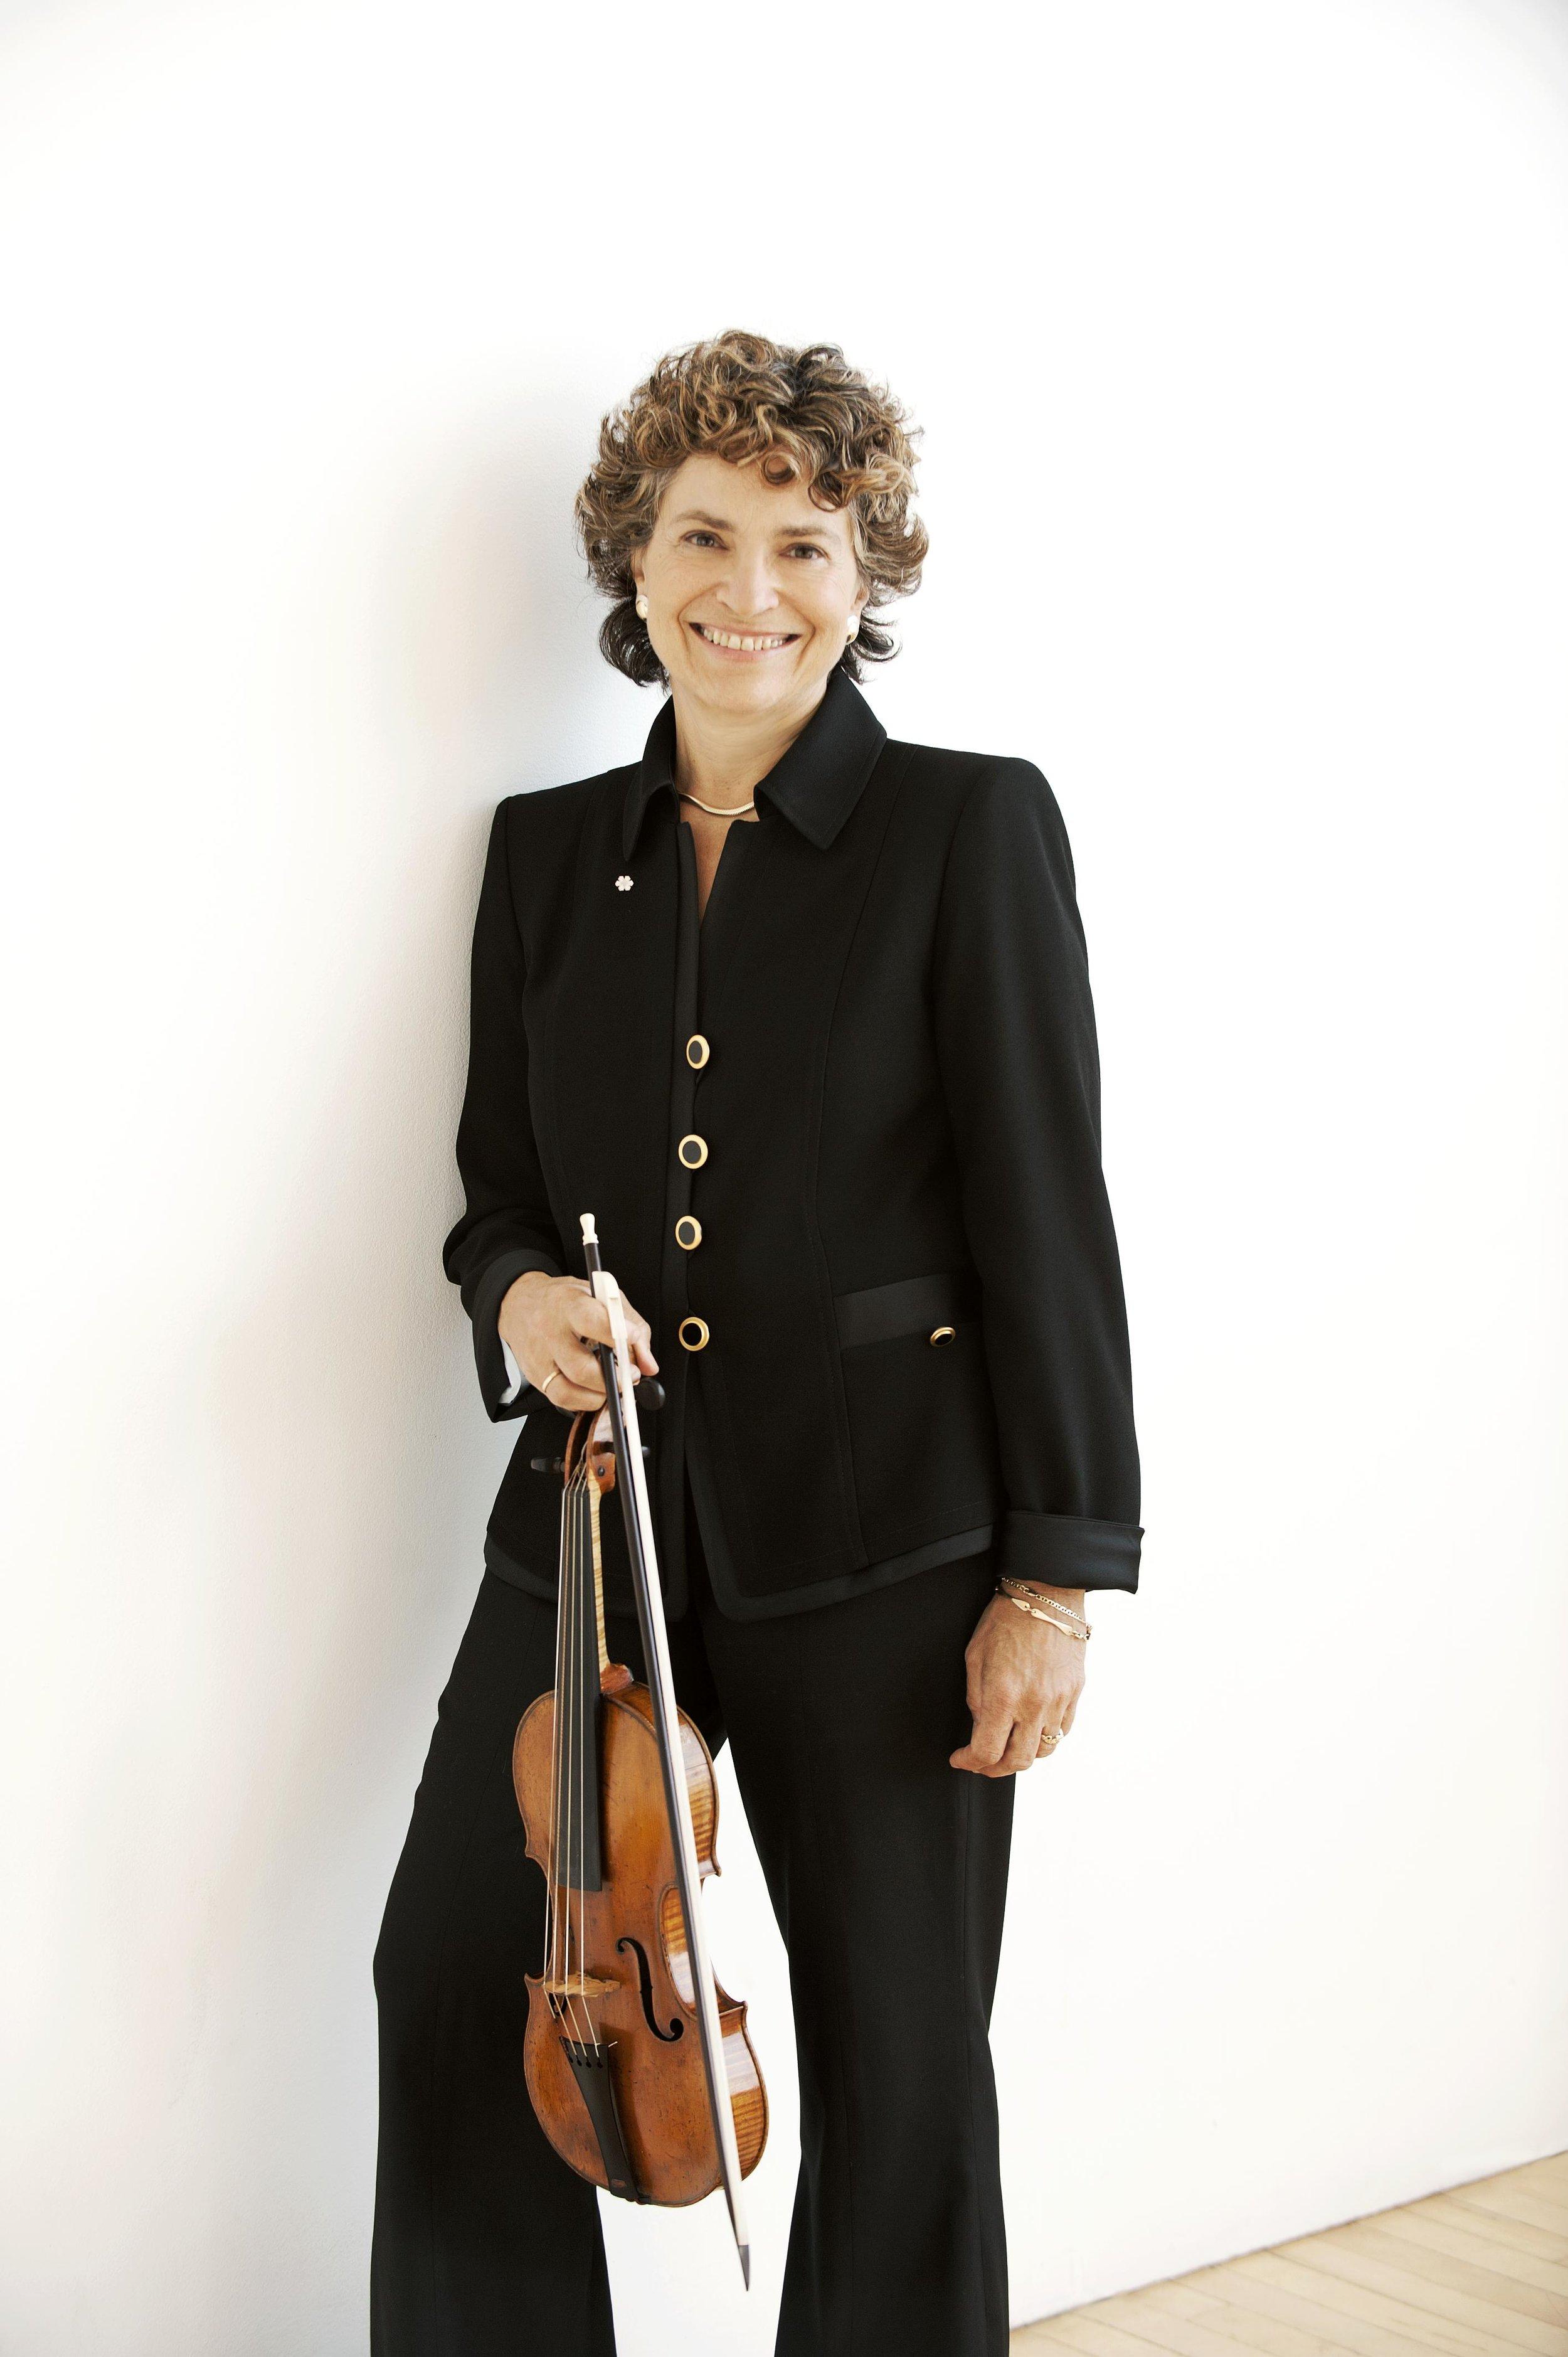 Jeanne Lamon, Music Director Emerita, Tafelmusik Baroque Orchestra. Photo by Sian Richards.